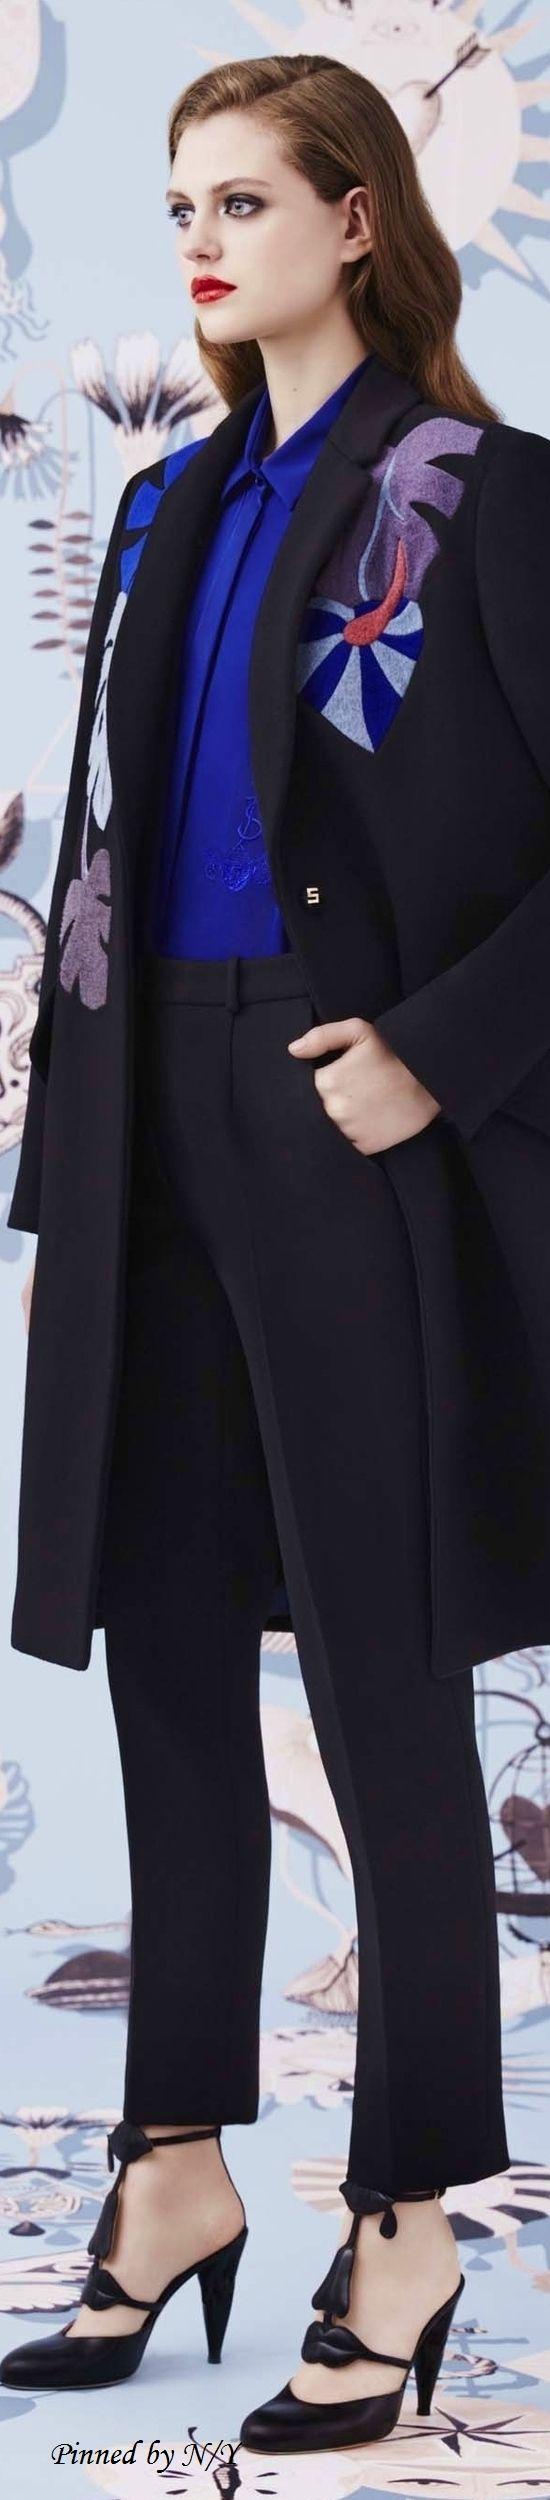 Schiaparelli Fall 2016 RTW Couture